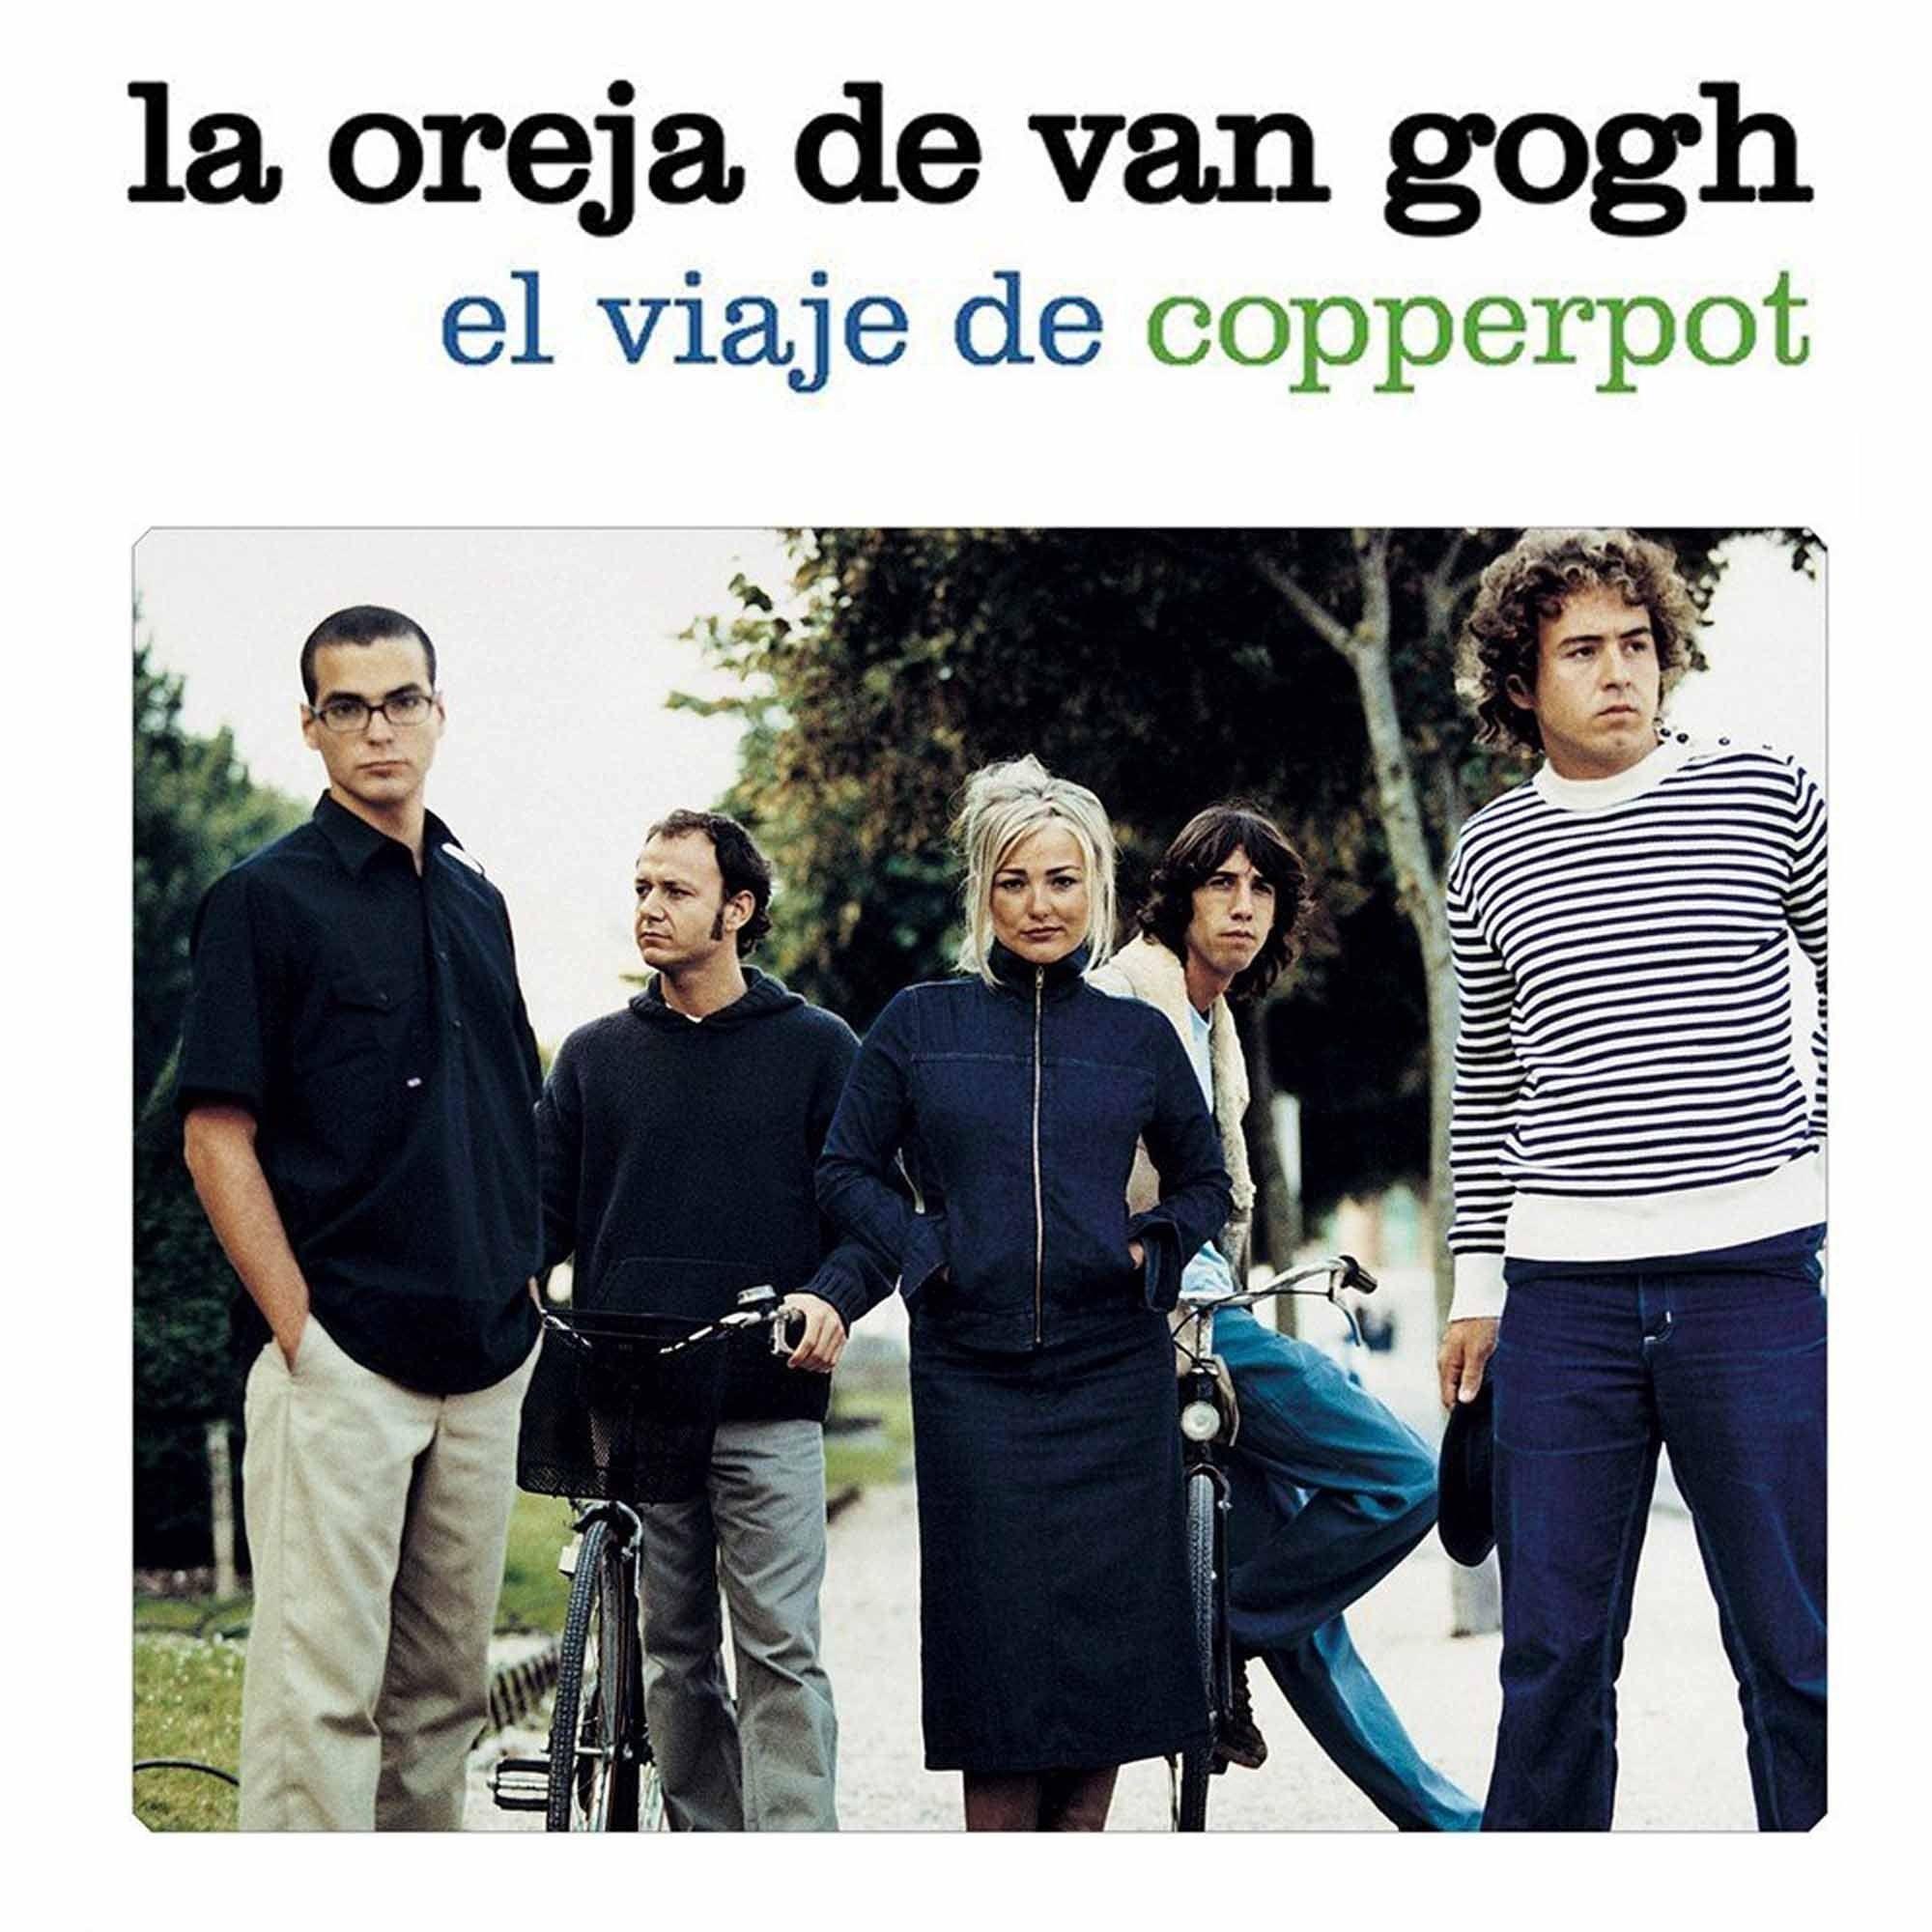 el viaje de copperpot 2000